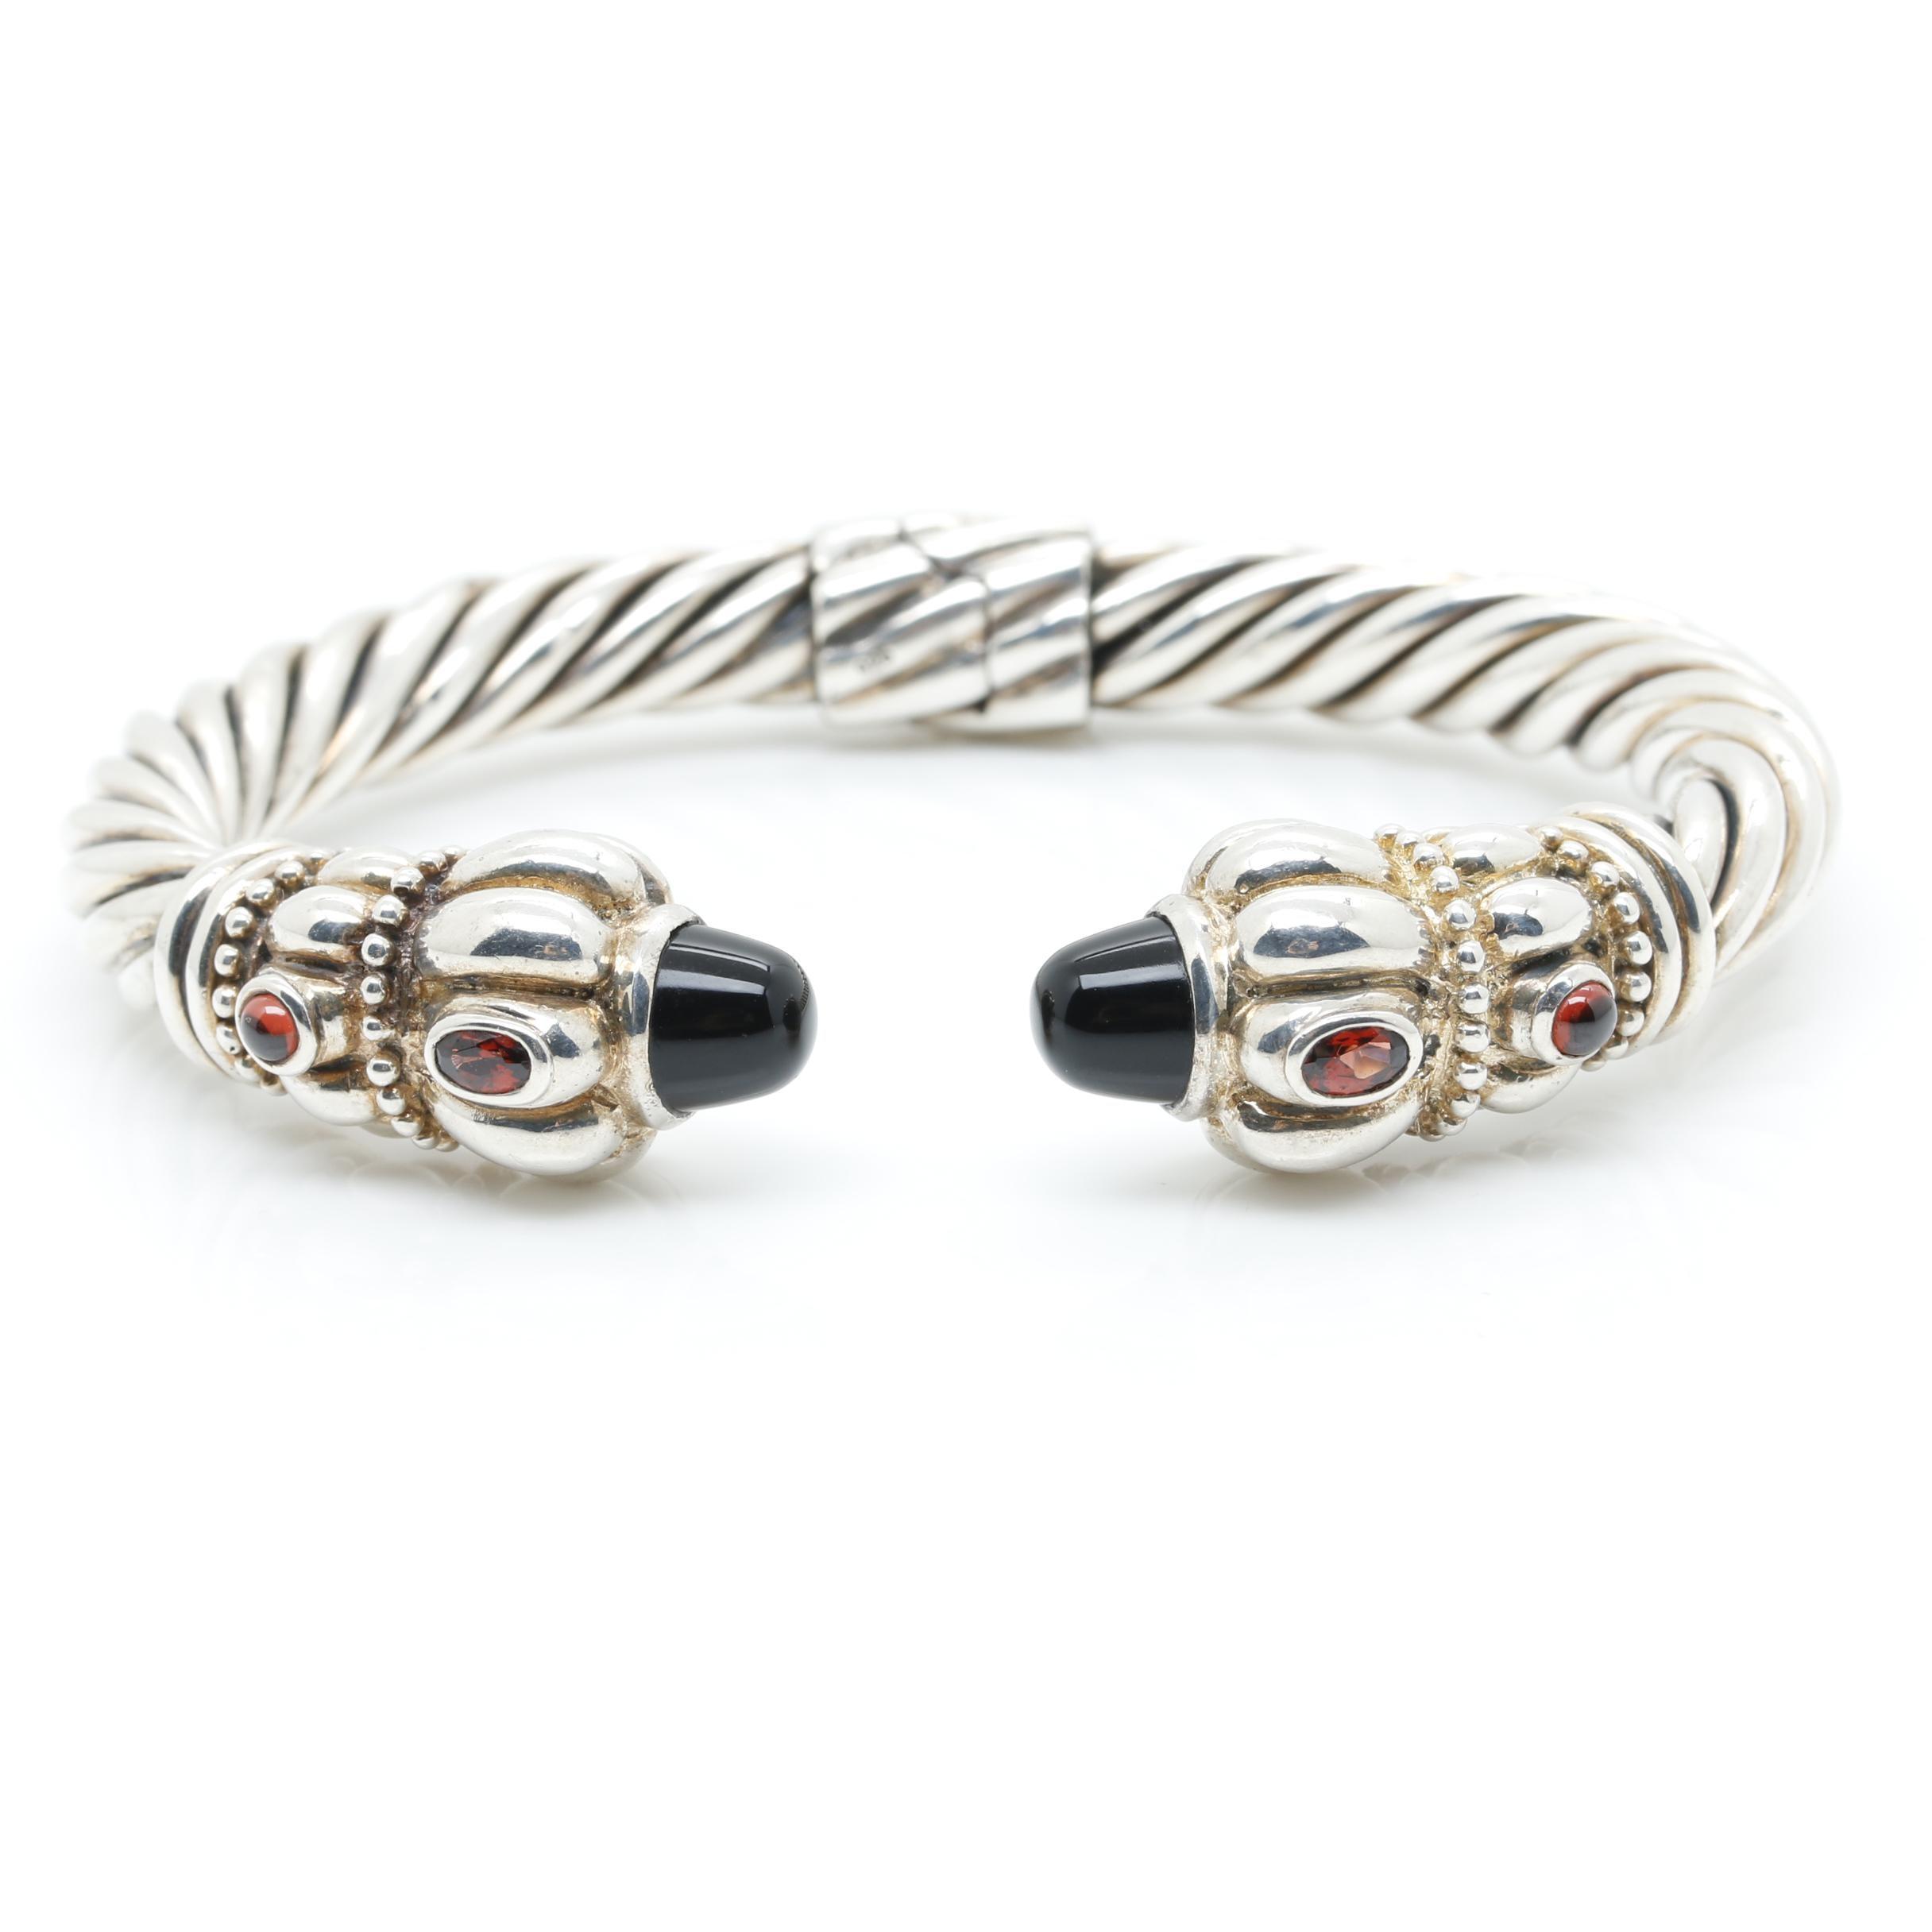 Sterling Silver Black Onyx and Garnet Clamp Cuff Bracelet